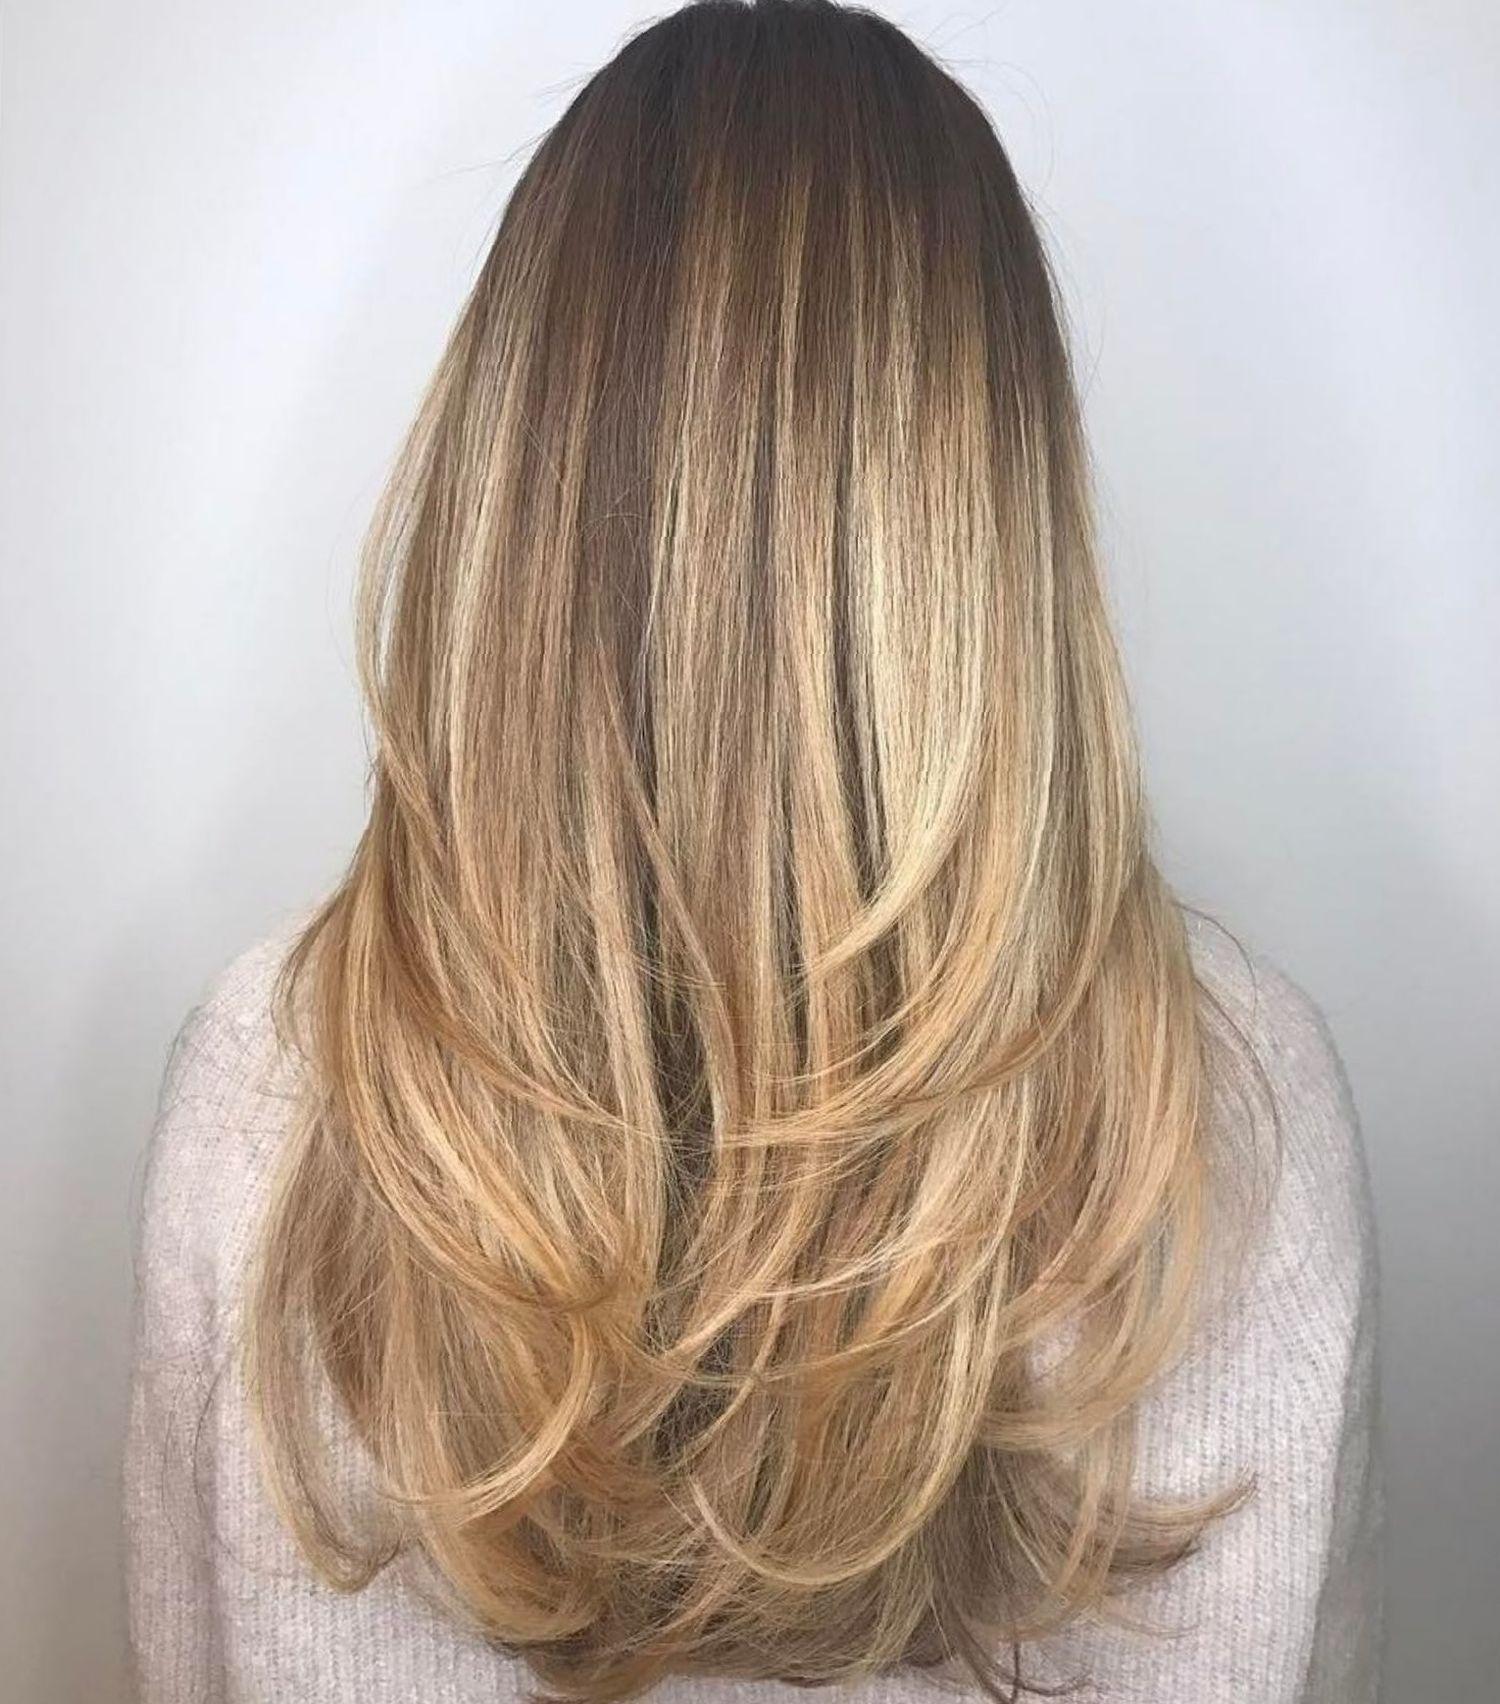 Long Haircut With Angled Layers Long Layered Haircuts Thick Hair Styles Long Layered Hair